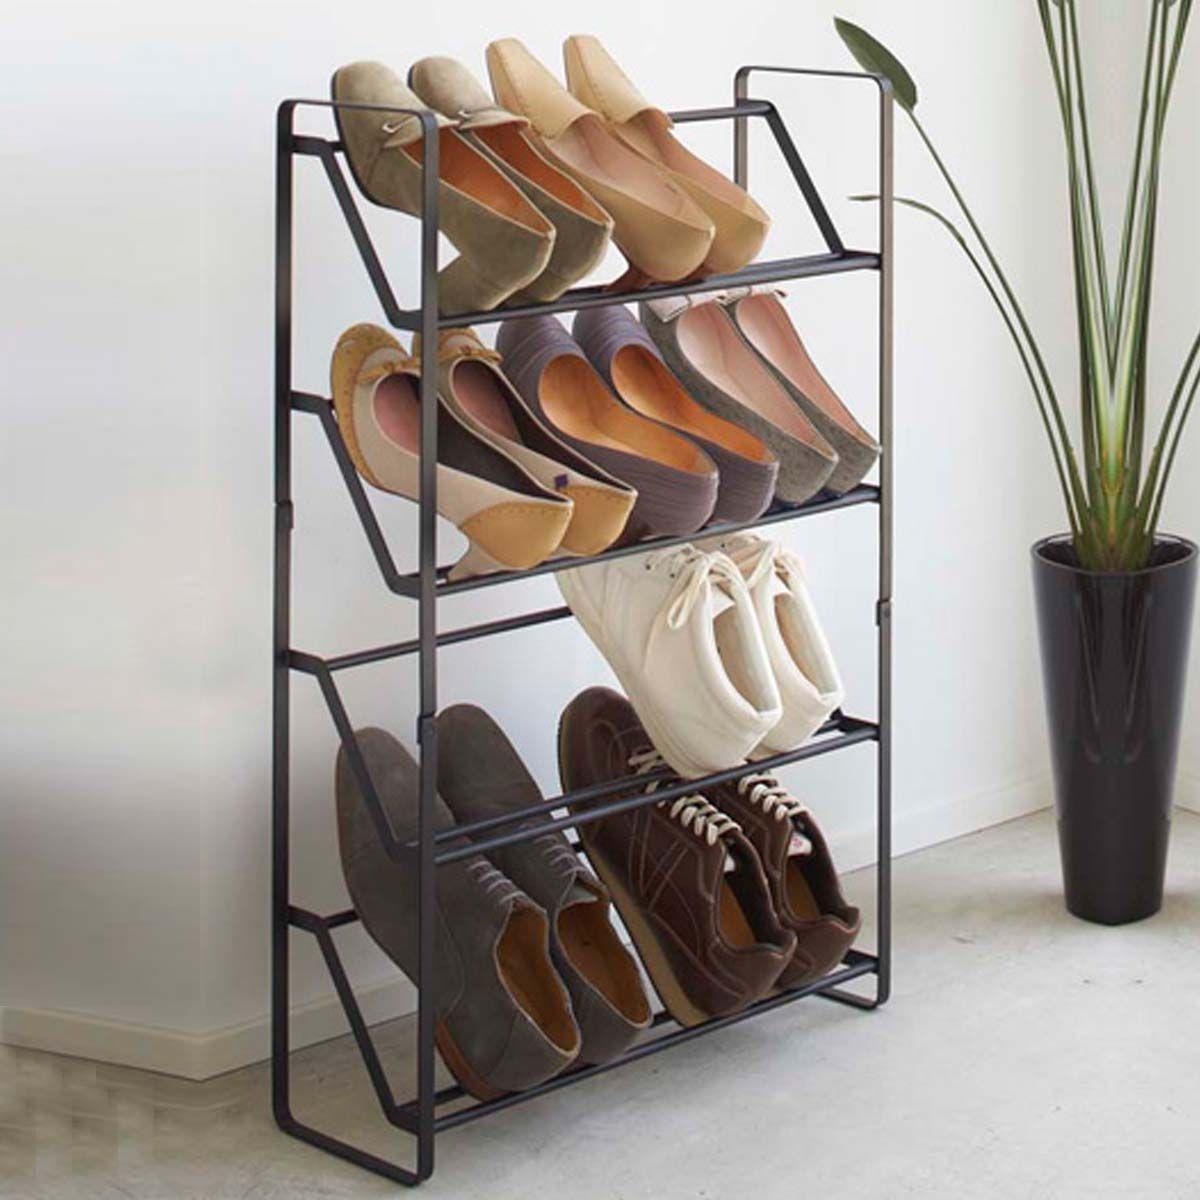 Comment Ranger Ses Chaussures comment ranger et organiser ses chaussures ?